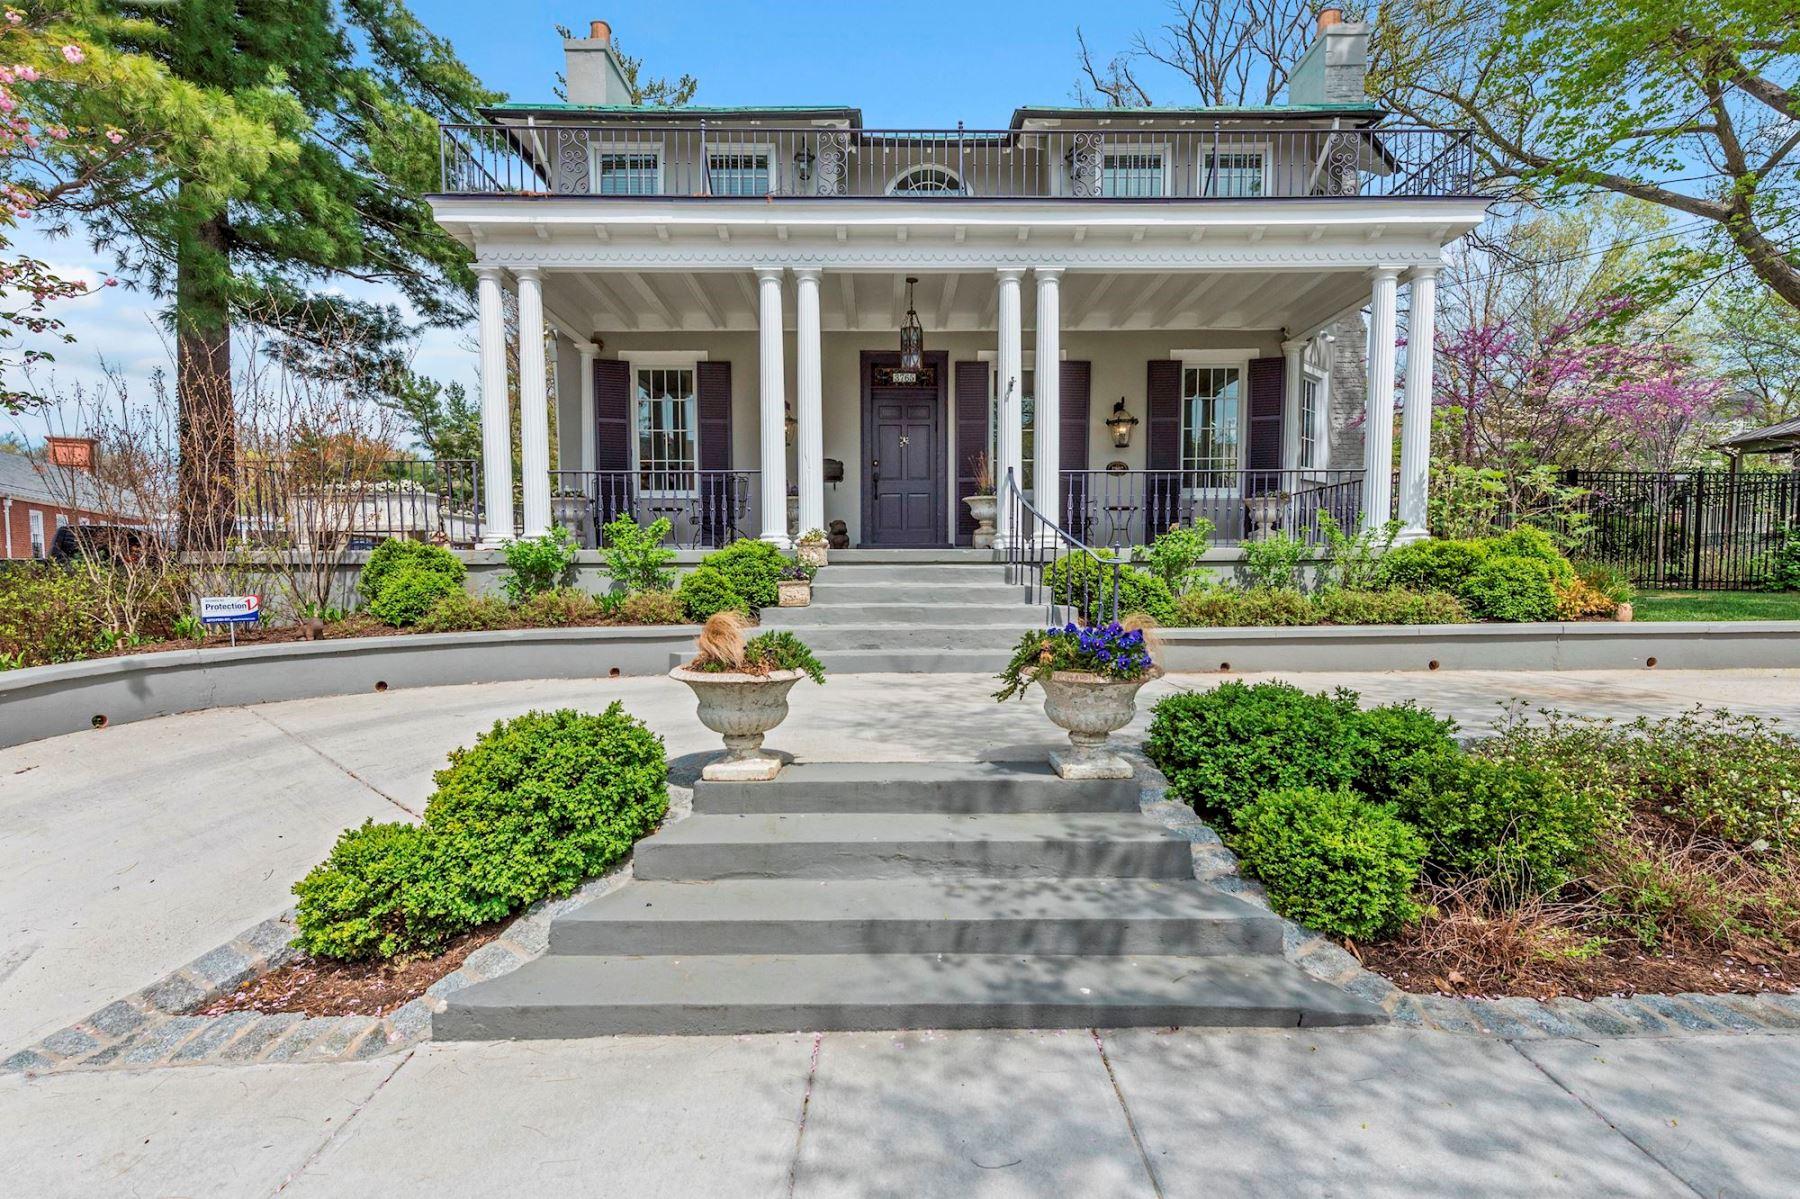 Single Family Home for Sale at 3765 Northampton Street, Washington Washington, District Of Columbia 20015 United States